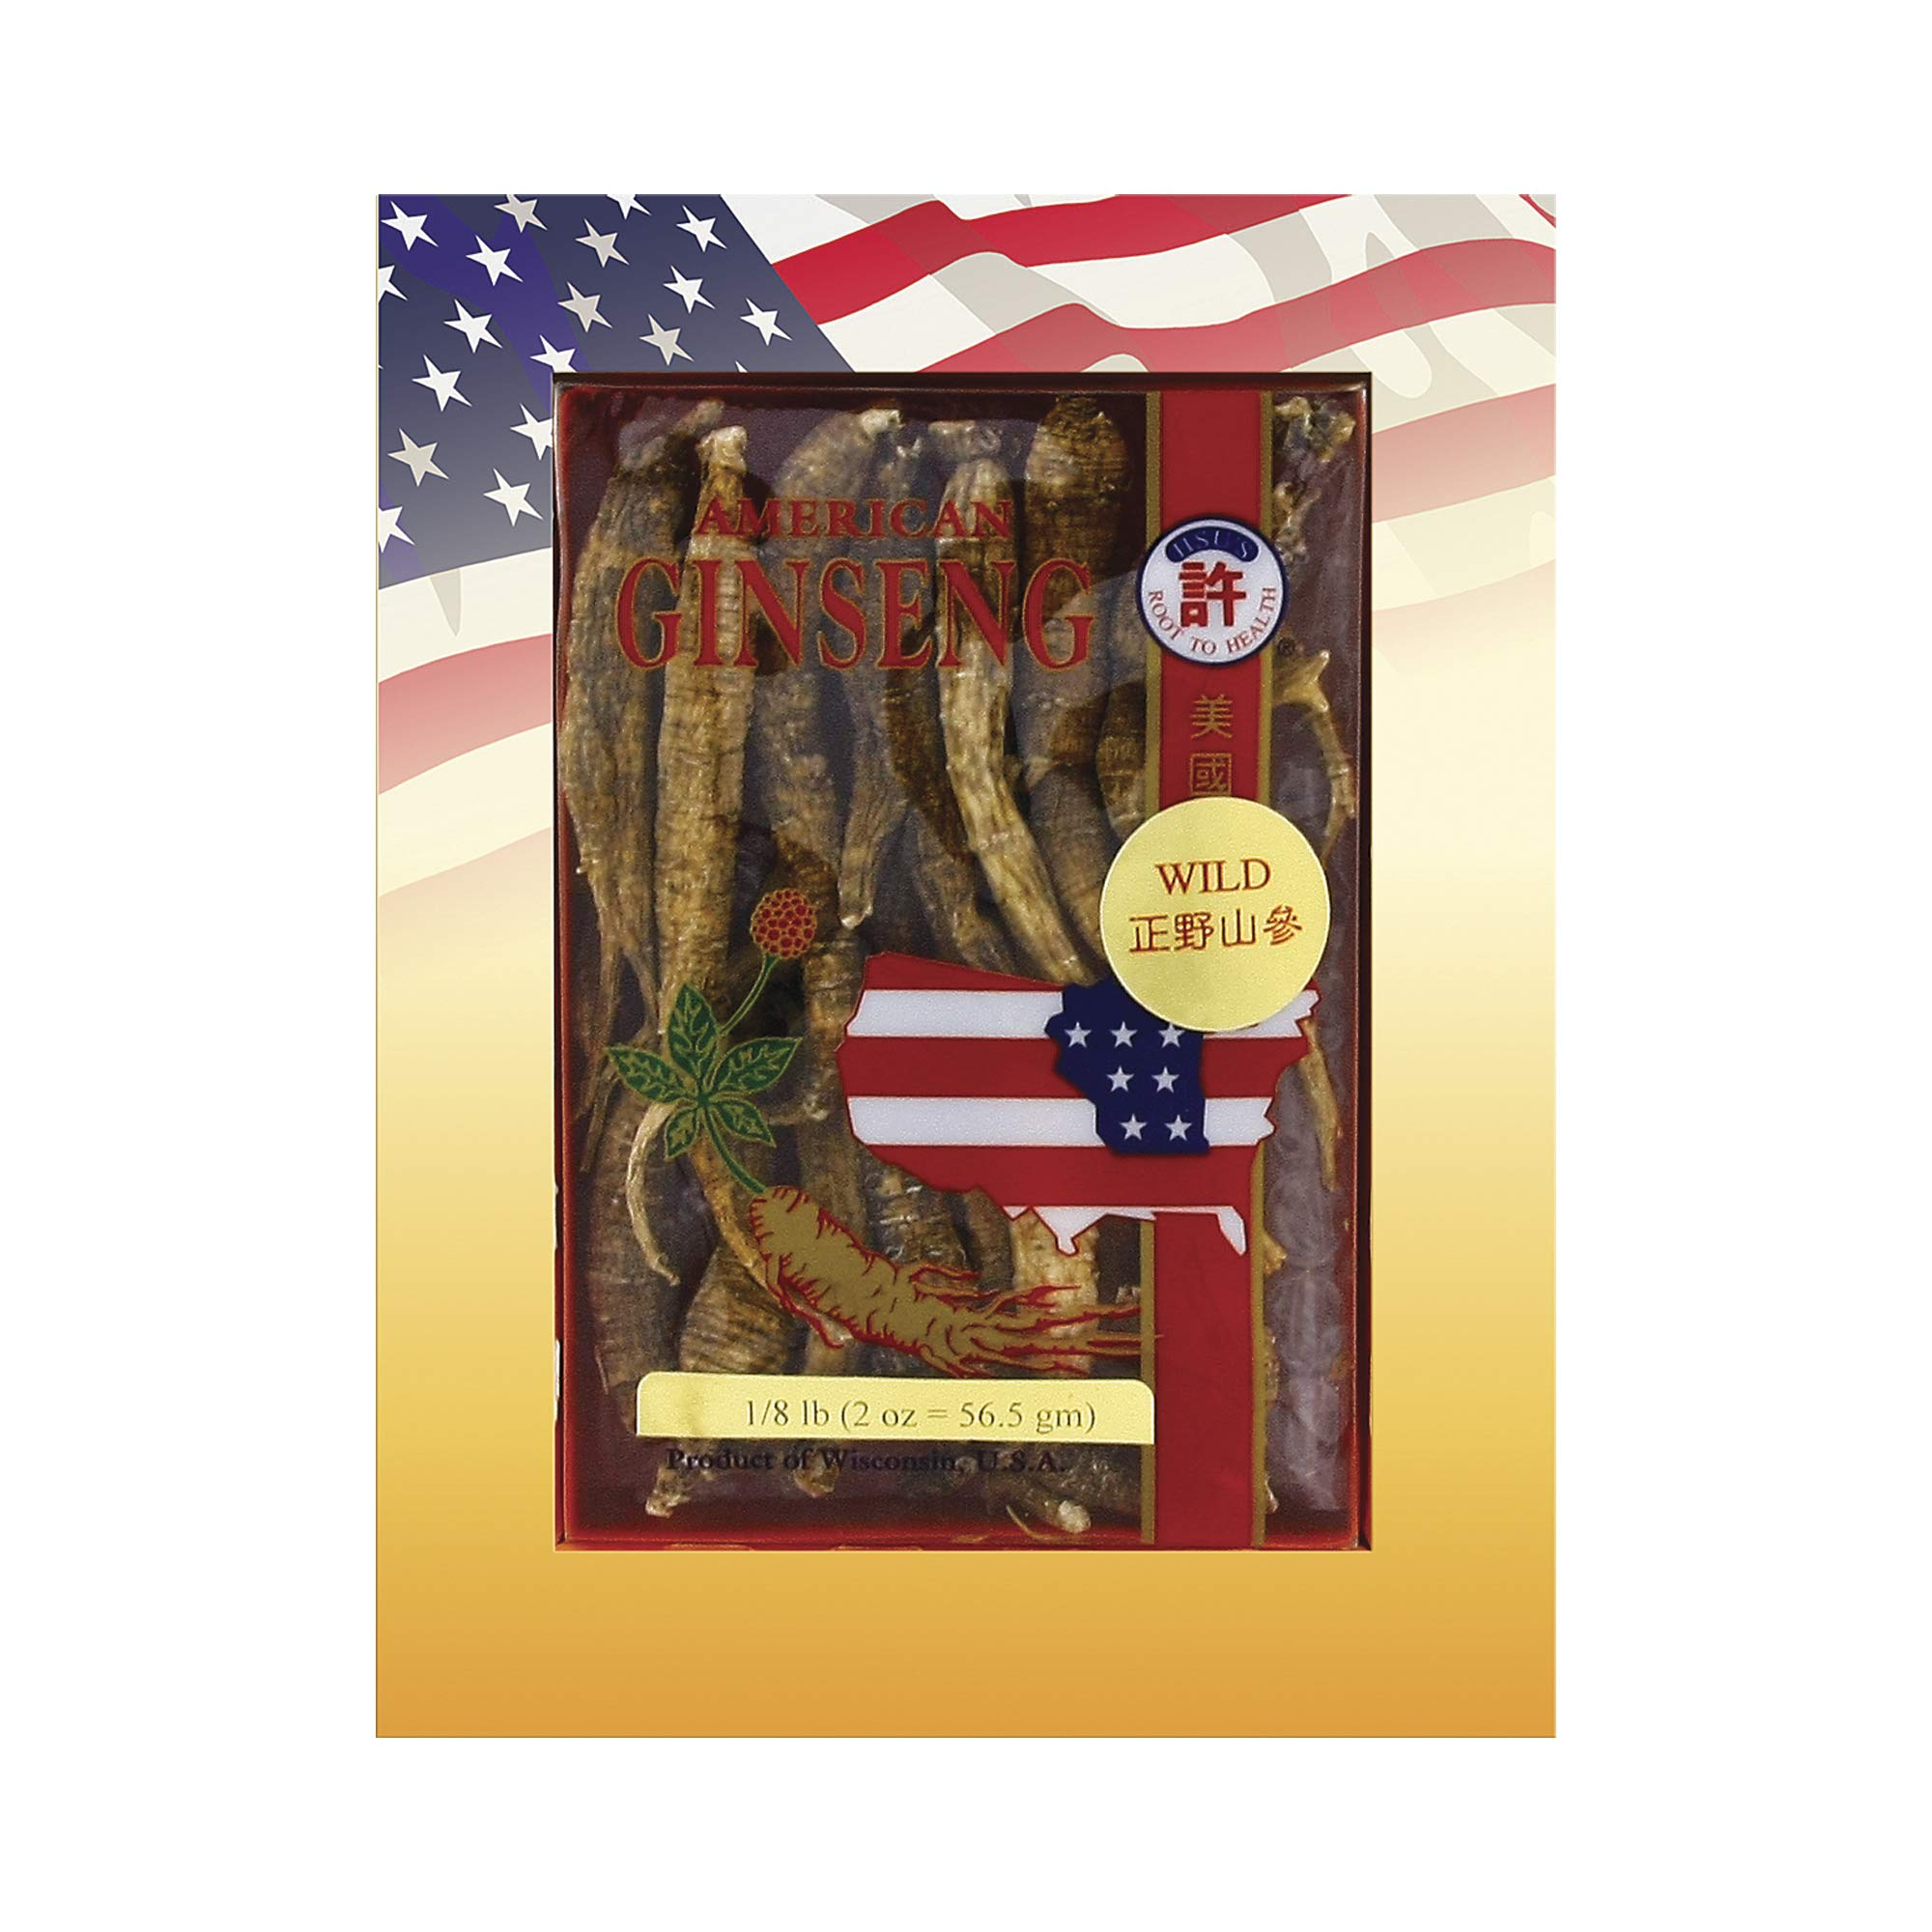 Hsu's Ginseng SKU 0301-2 | Wild Long Large | Wild American Ginseng | 许氏花旗参正野山參長型大號 | 2 oz Box, 西洋参, 野山參